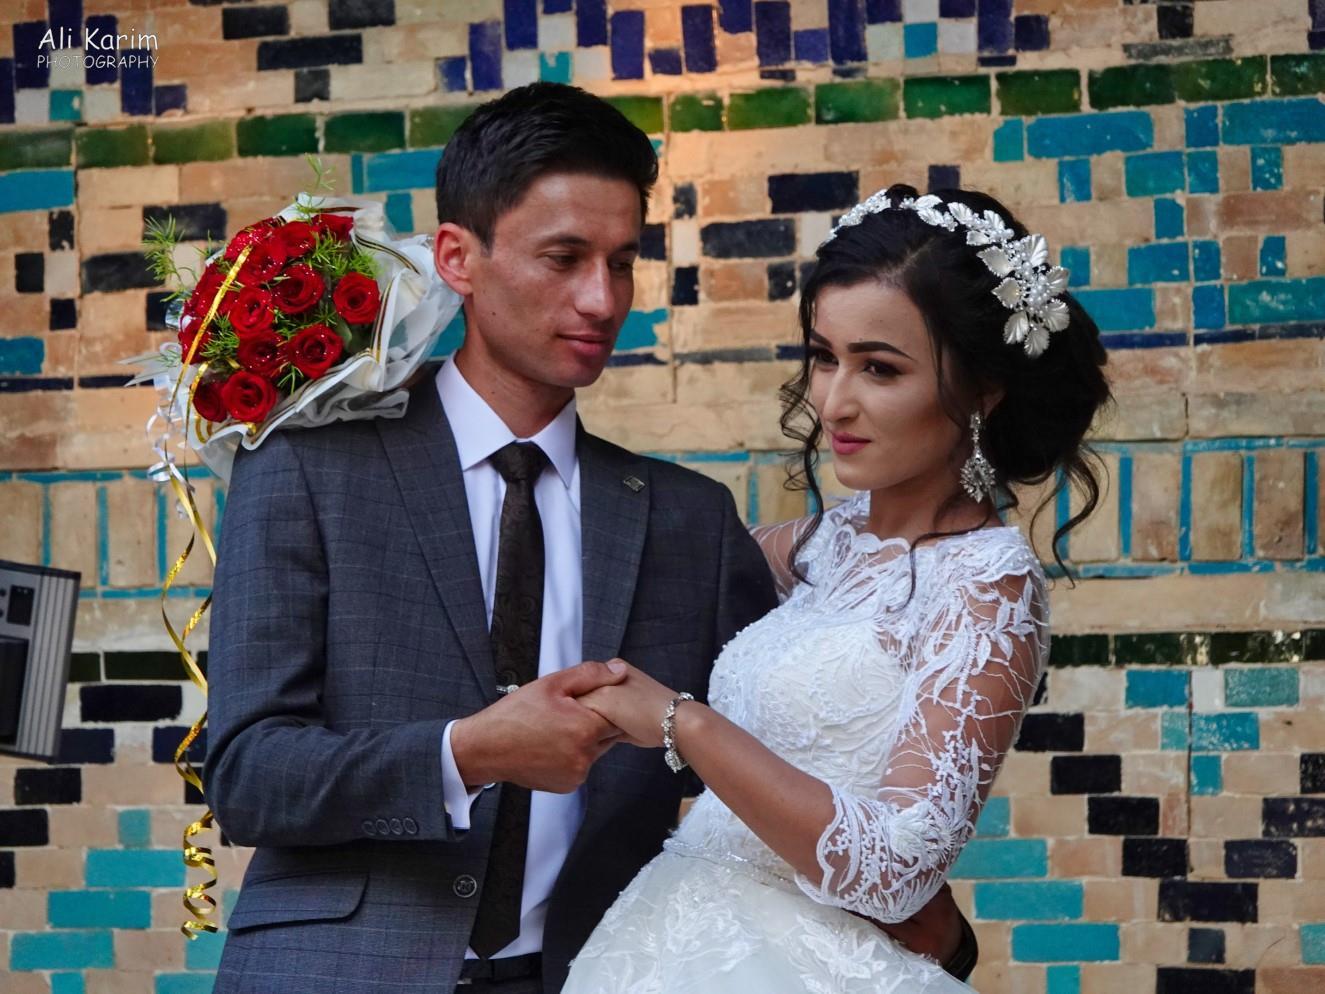 Bukhara, Oct 2019, Newlyweds on a photo shoot